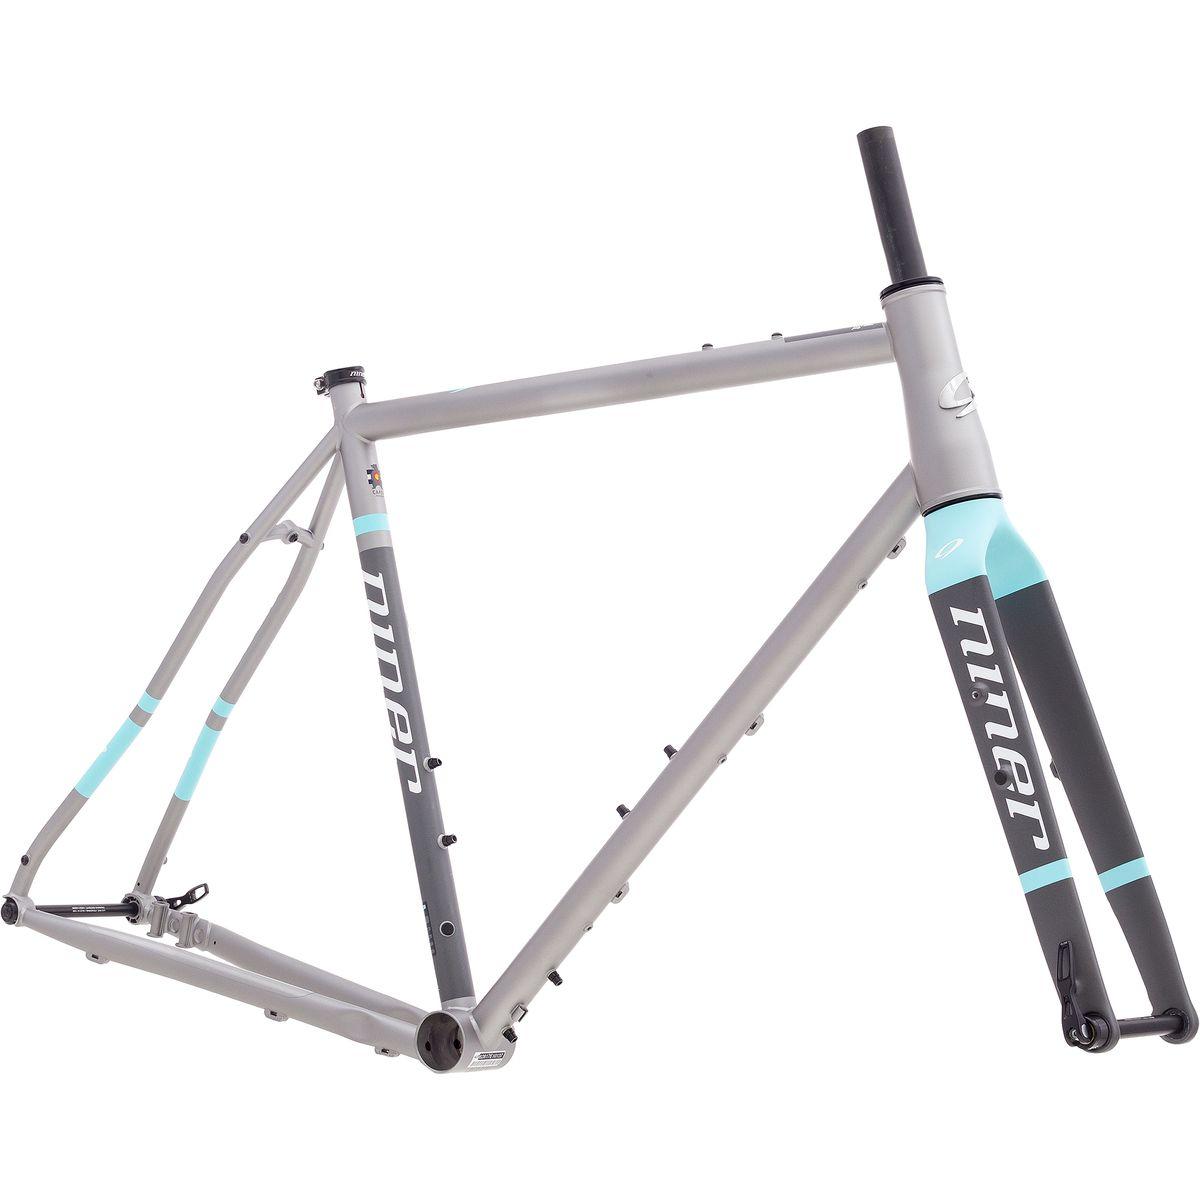 Niner RLT 9 Steel Frameset - 2018 | Competitive Cyclist